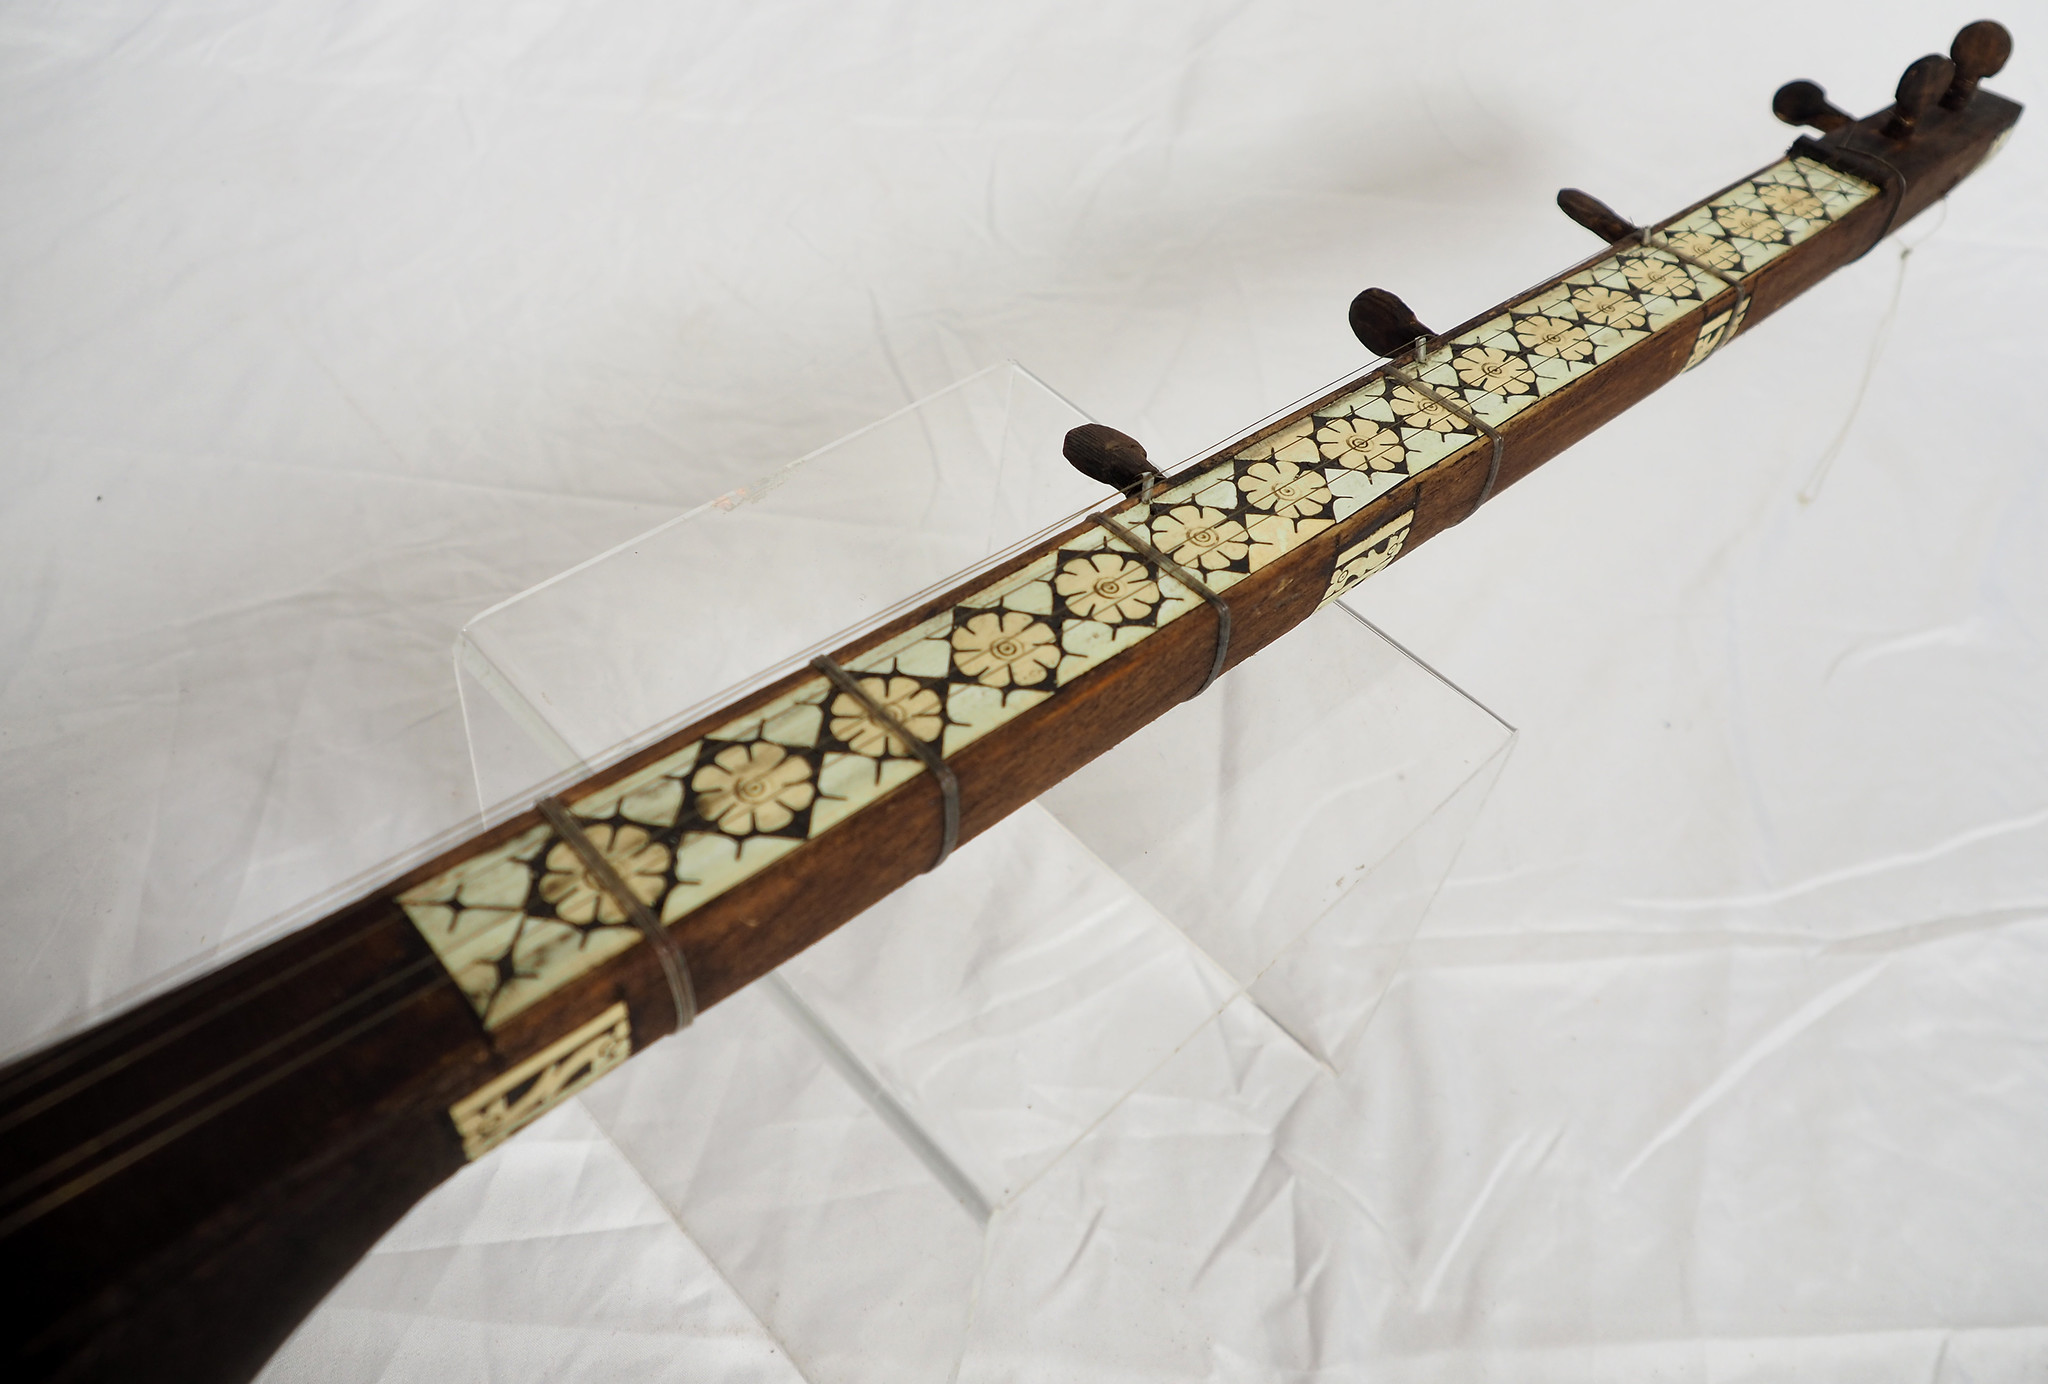 afghan folk music instrument Tambur Tanbur tanboor from Afghanaistan  Bone inlay  تنبور No:21/B